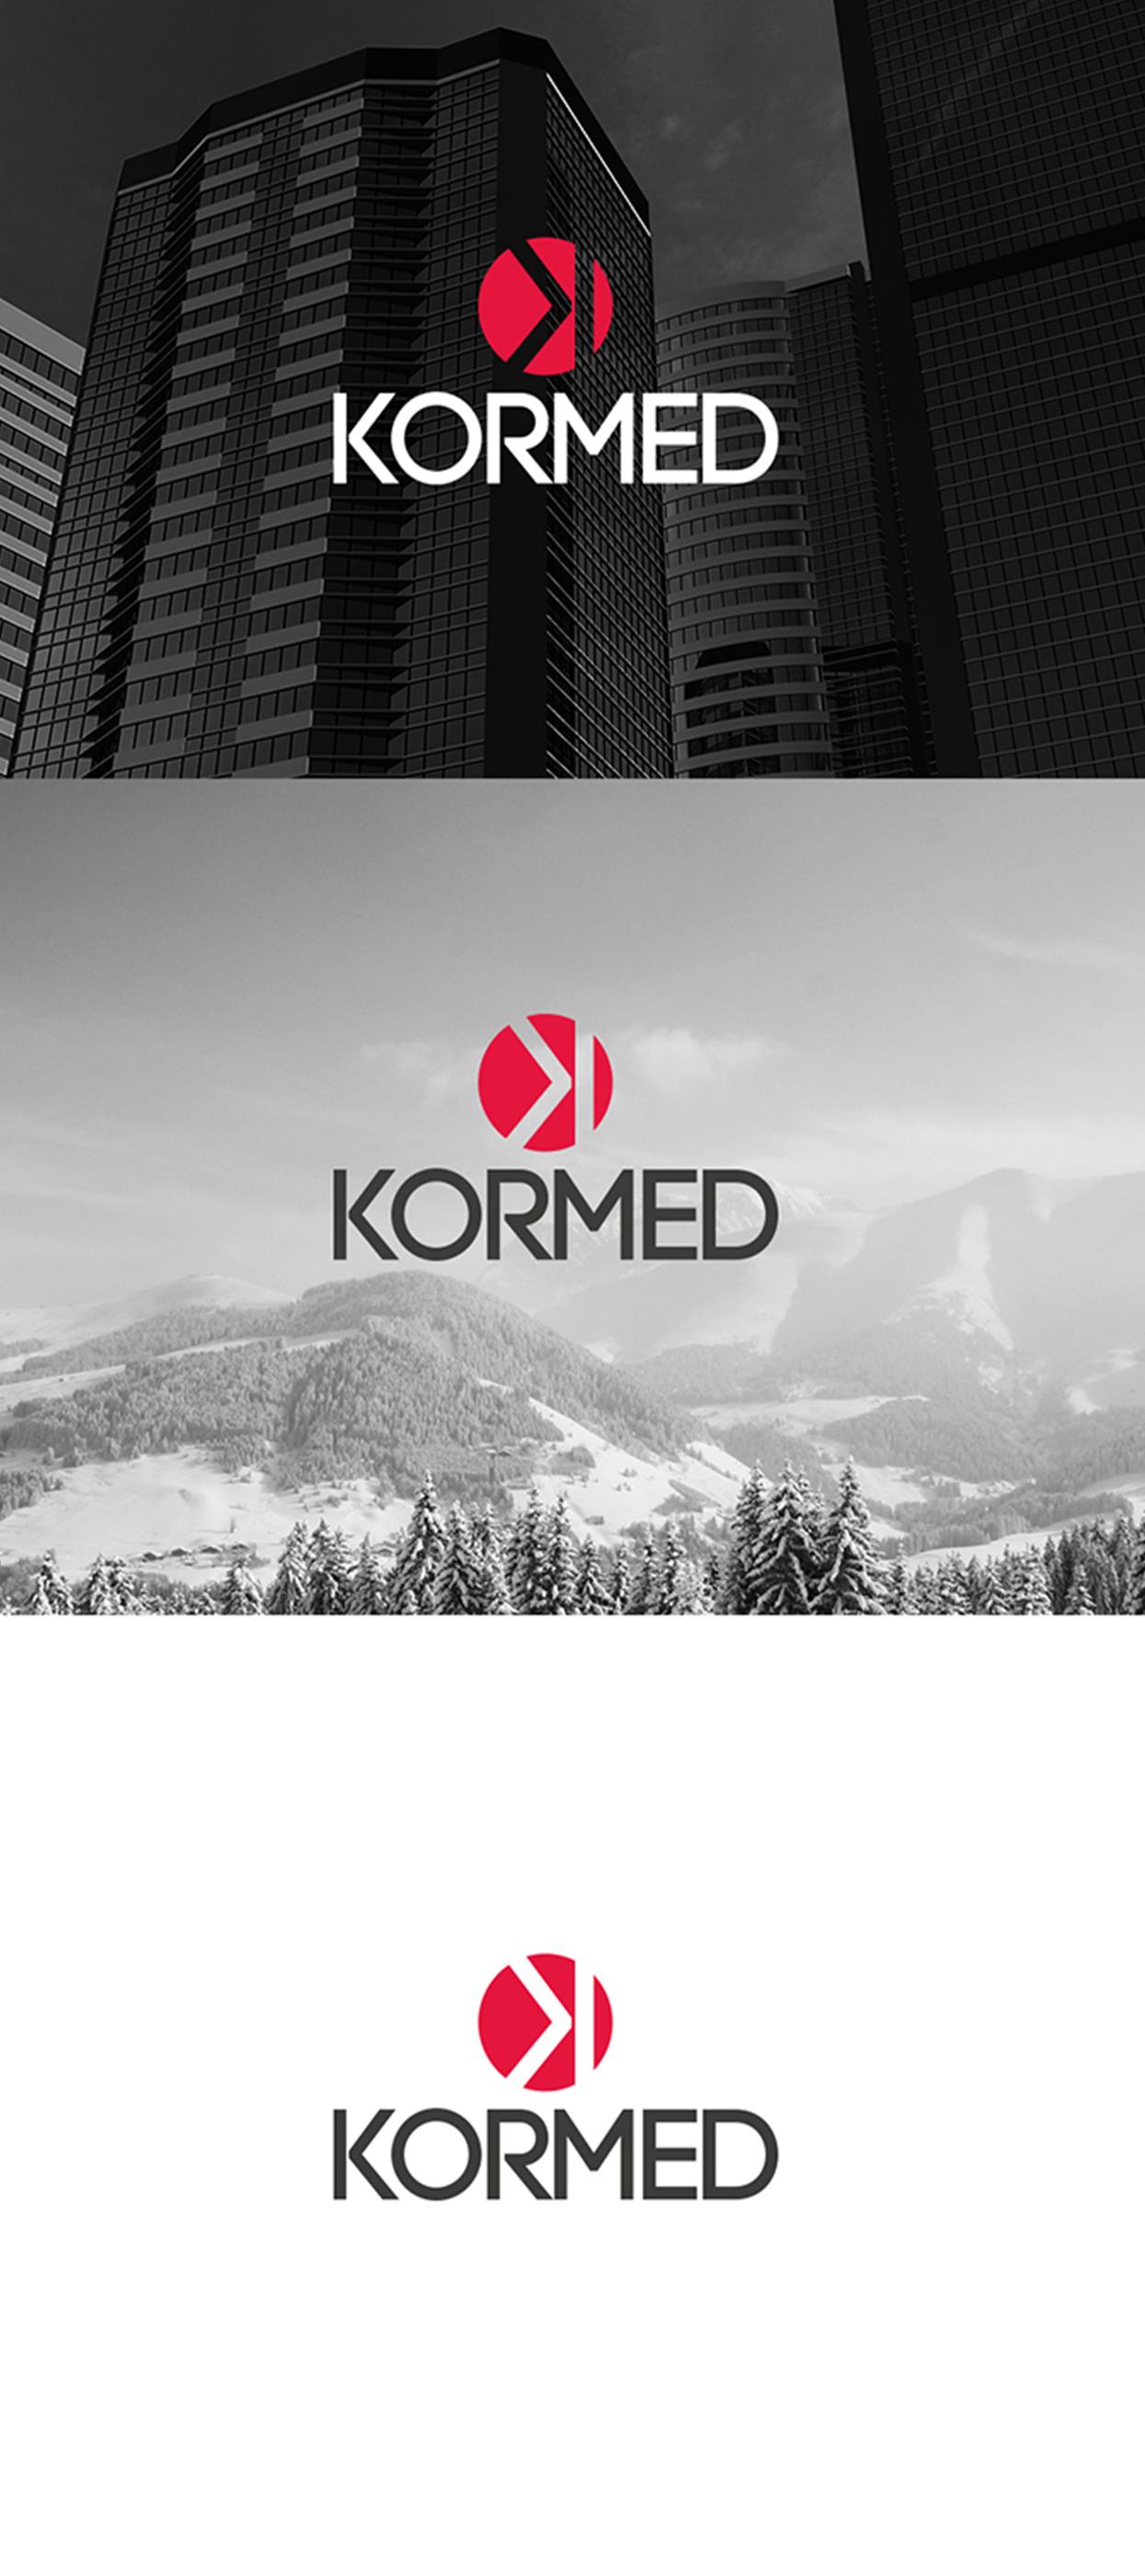 artcore-creative-logo-identity-design-kormed-logo